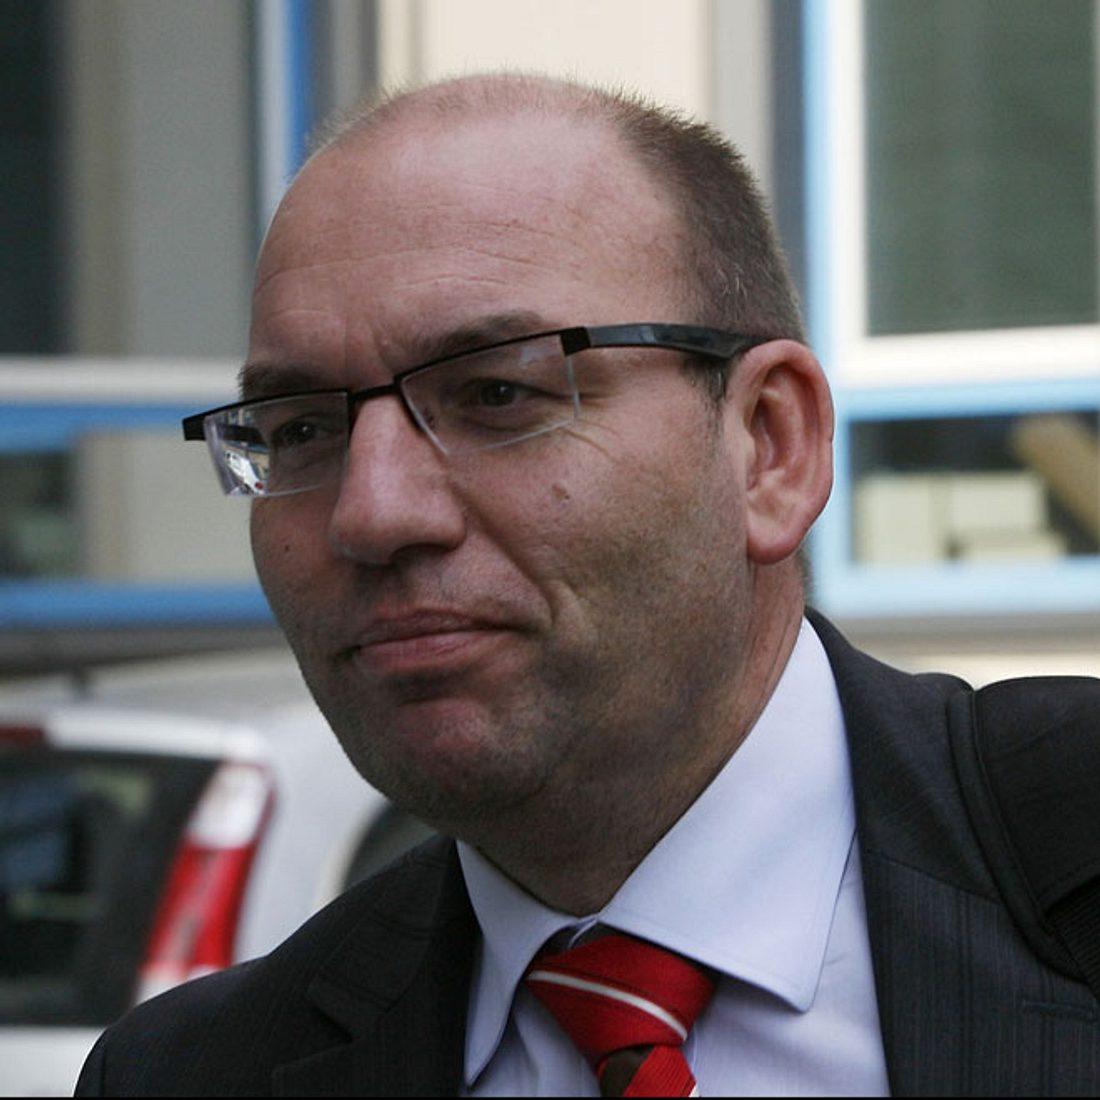 SPD-Politiker Manfred Schaub ist tot